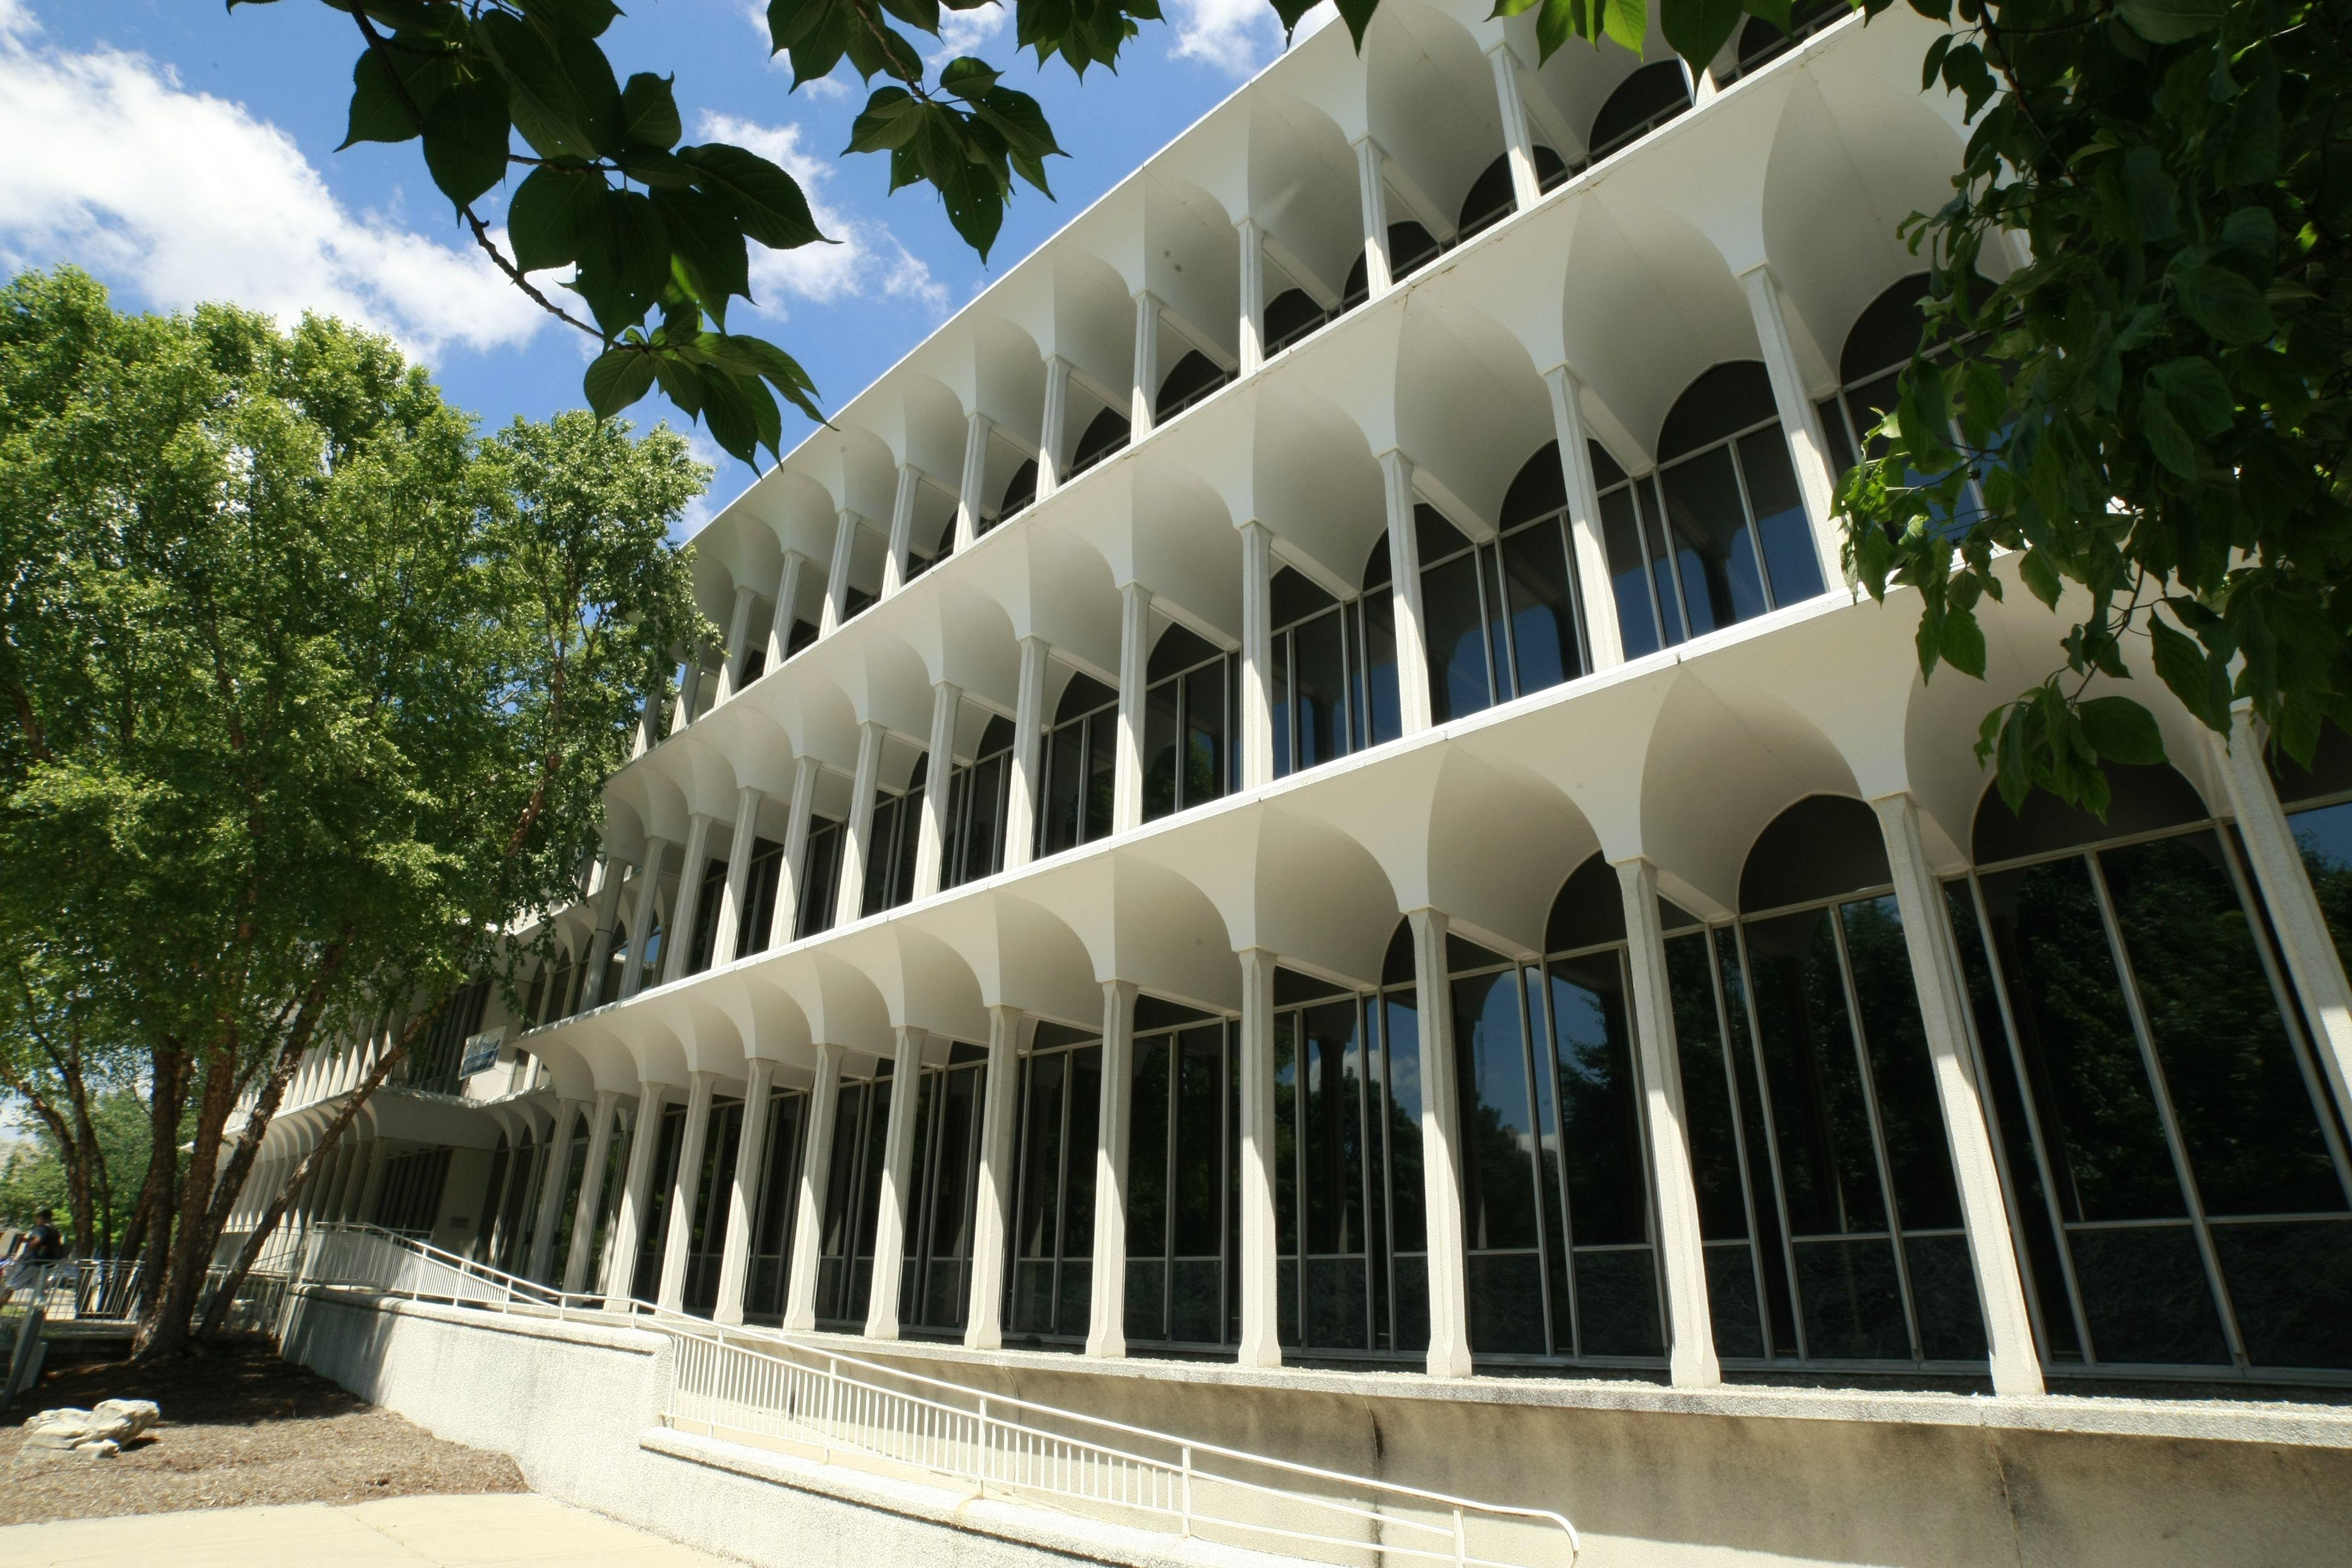 Butler University Irwin Library